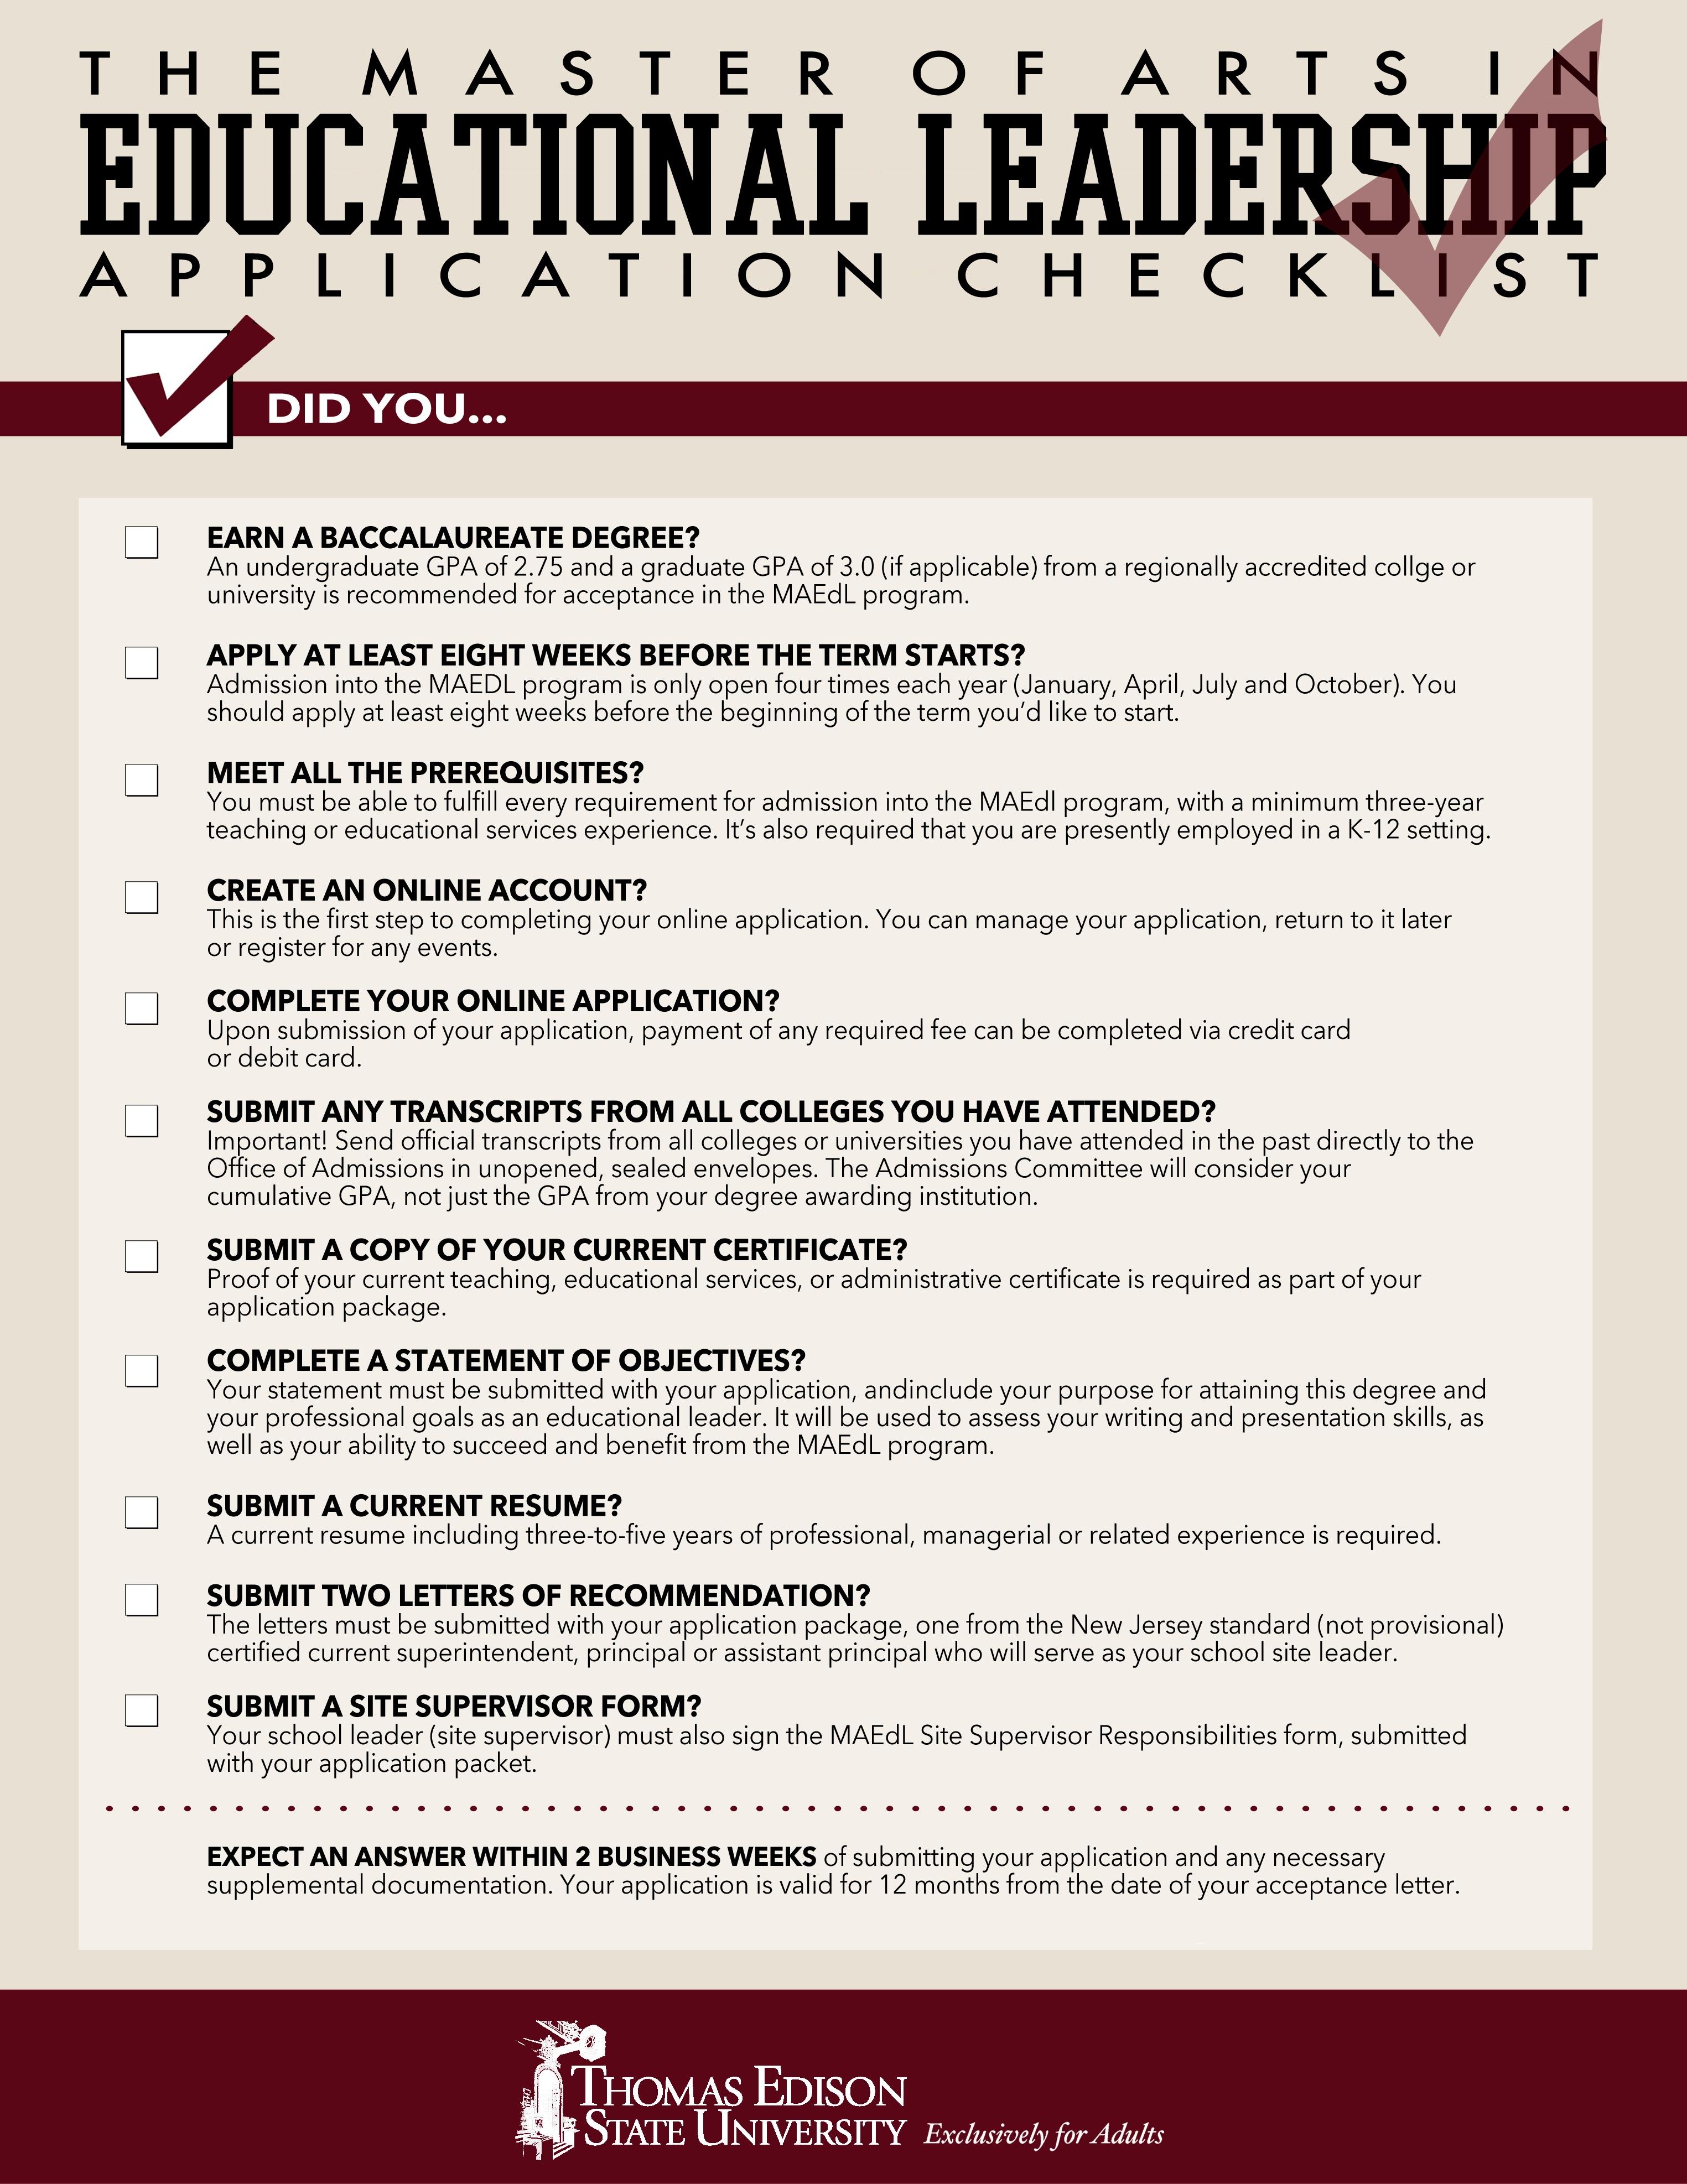 Thomas_Edison_State_University_MAEDL_application_checklist